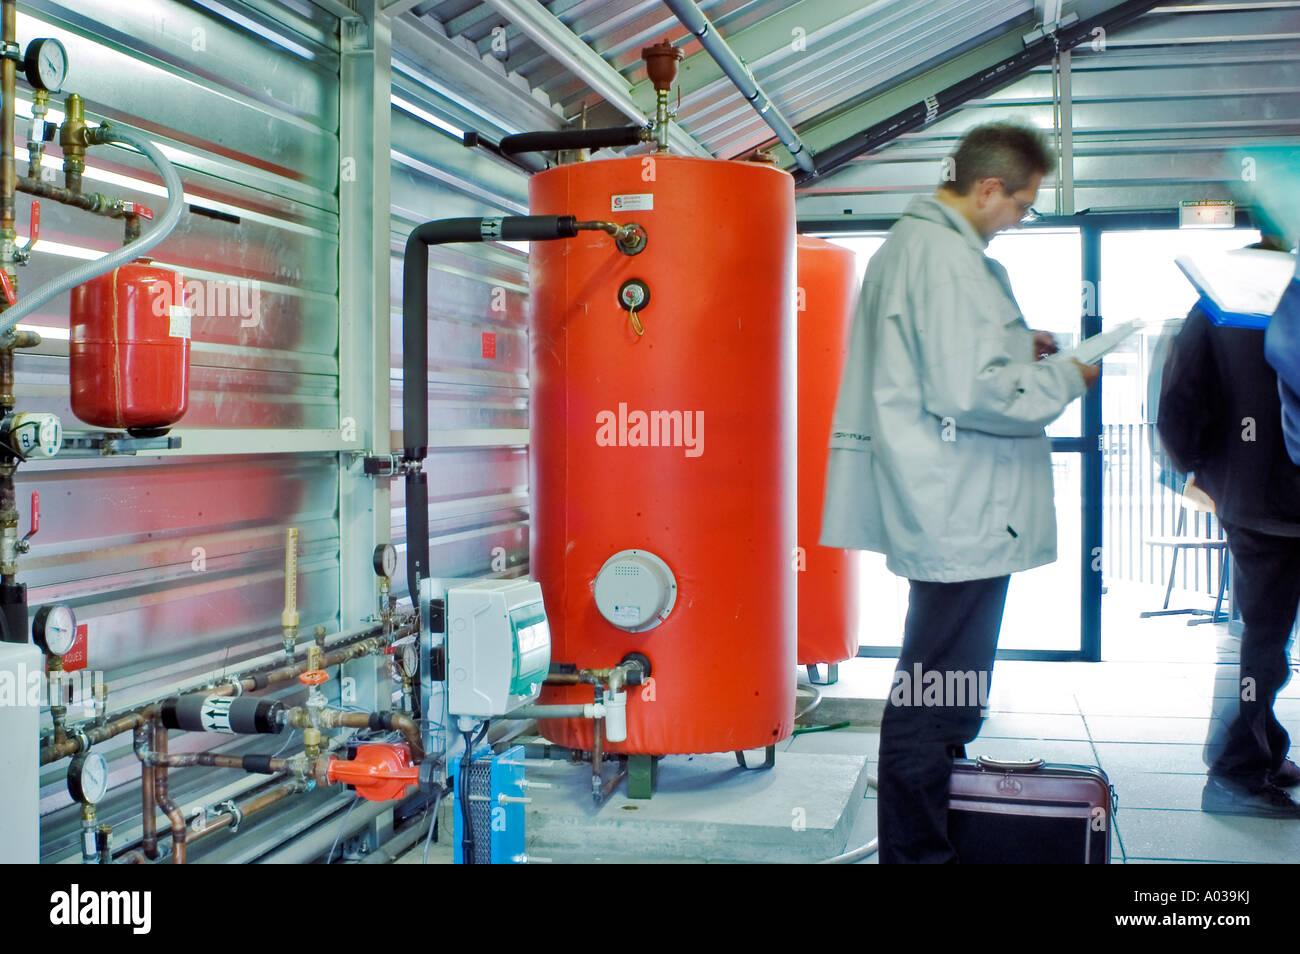 Storage Heater Stock Photos & Storage Heater Stock Images - Alamy